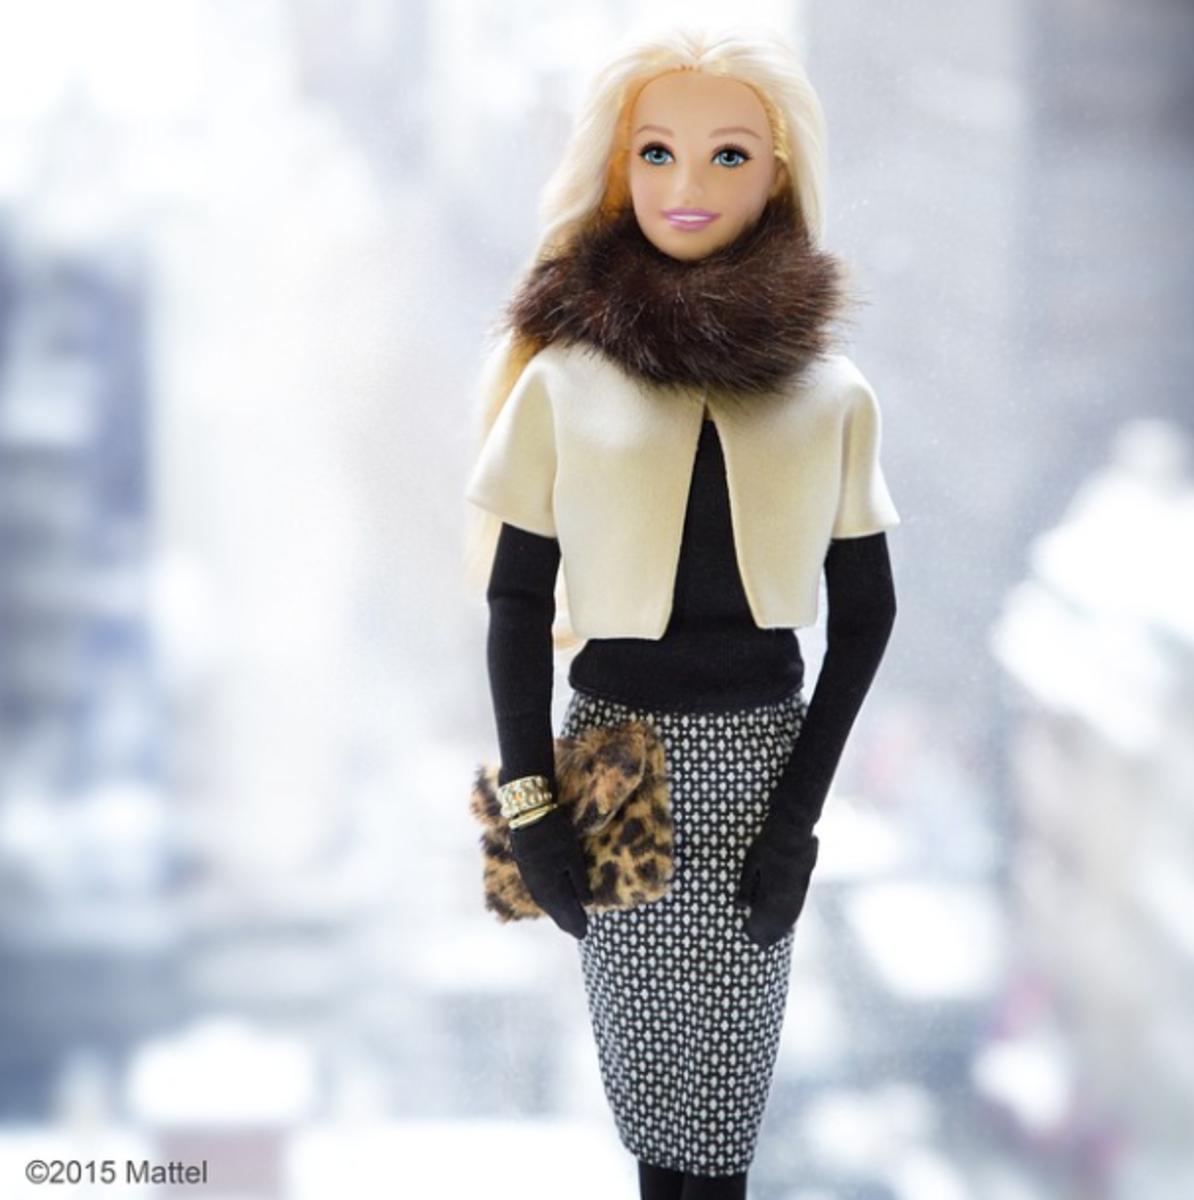 Best's infamous snowy Barbie shoot. Photo: Courtesy